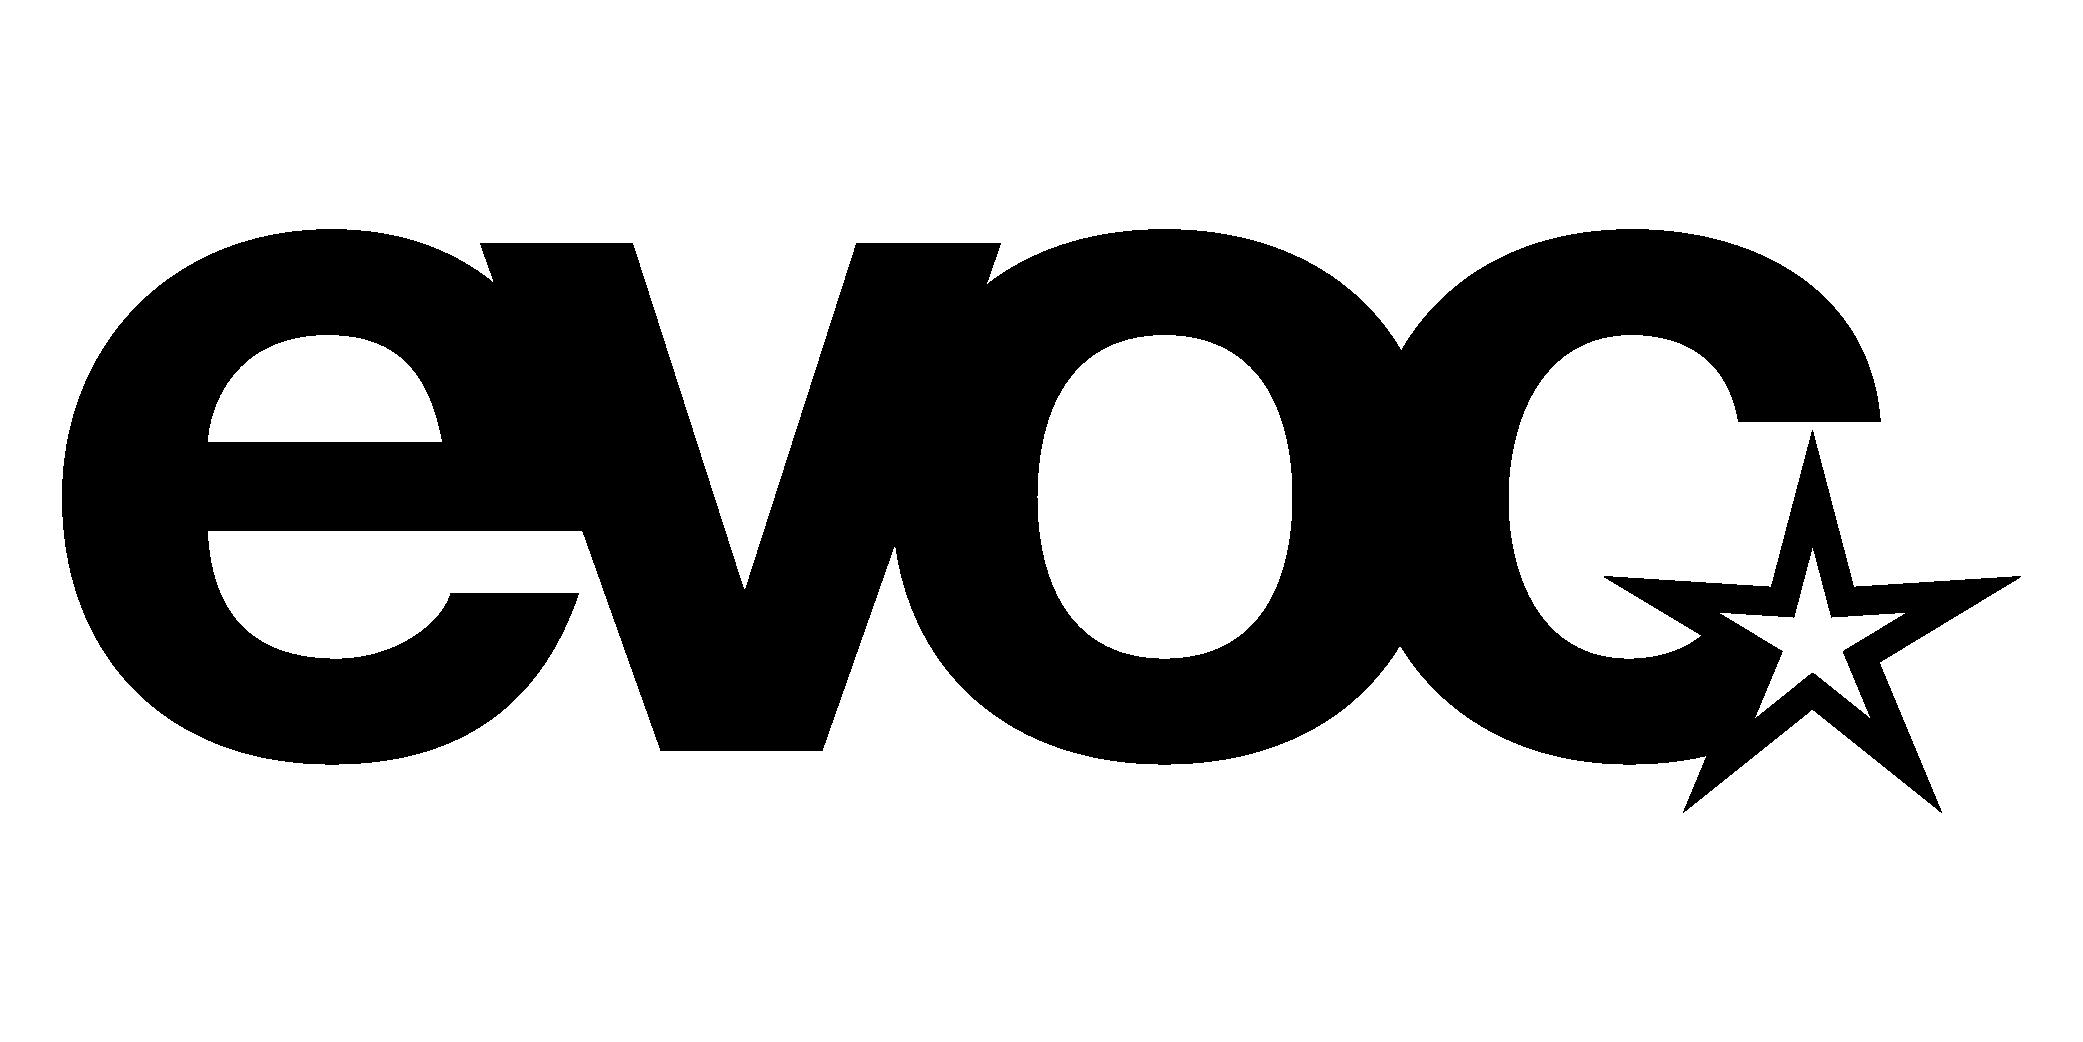 evoc, Logo/Brand | matadorworld.innsbruck